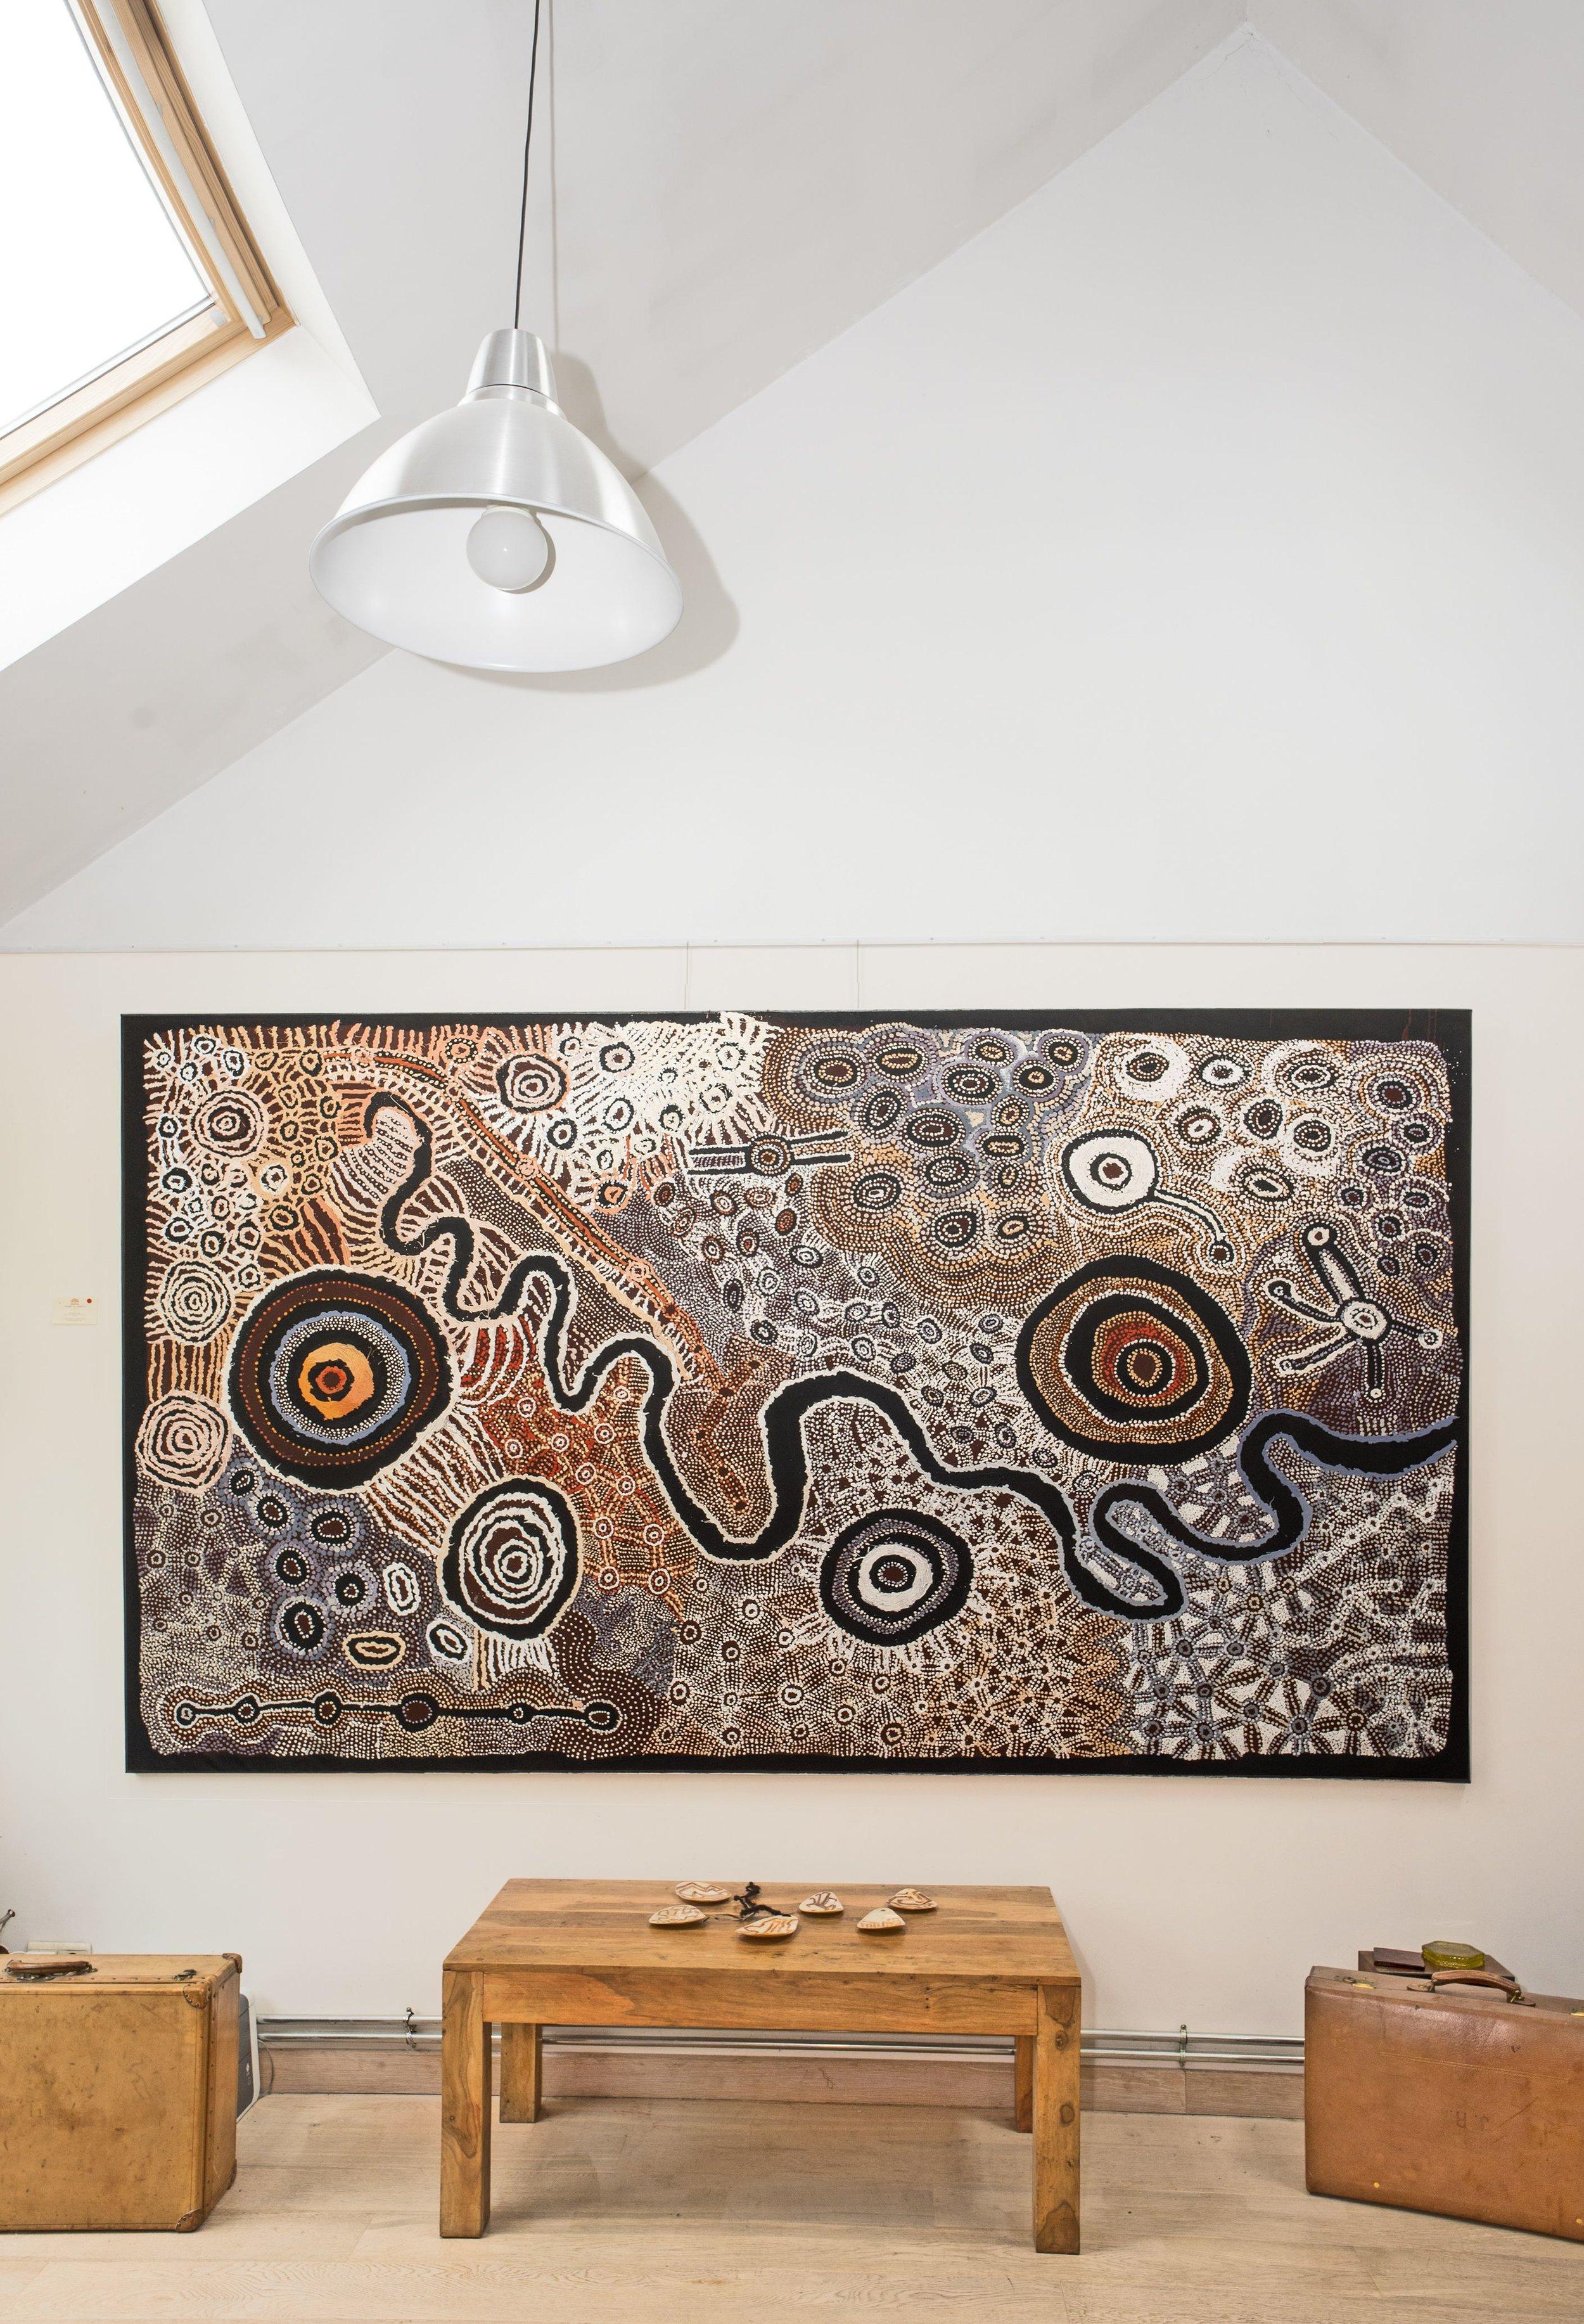 Œuvre collaborative magistrale Watarru des artistes femmes de la communauté de Nyapirri (APY land). Format : 300 x 180 cm. © Photo : Aboriginal Signature Estrangin gallery with the courtesy of the artists and Tjungu Palya Art.